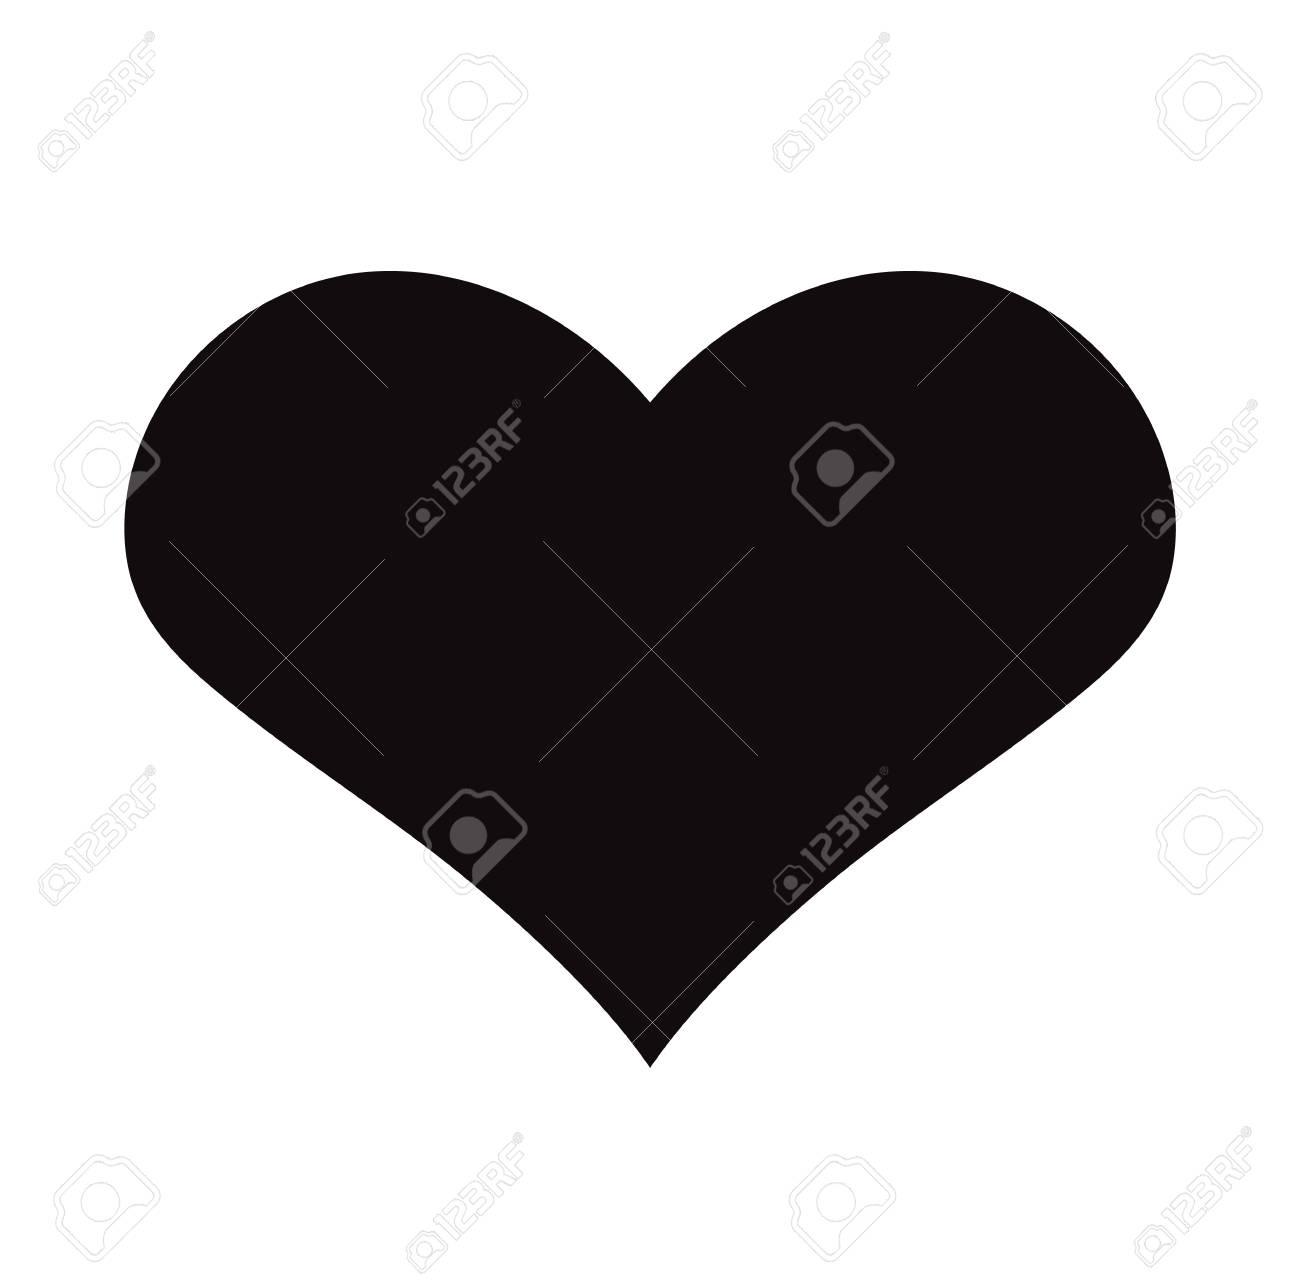 Flat Black Heart Icon Isolated on White Background. Vector illustration. - 121676834